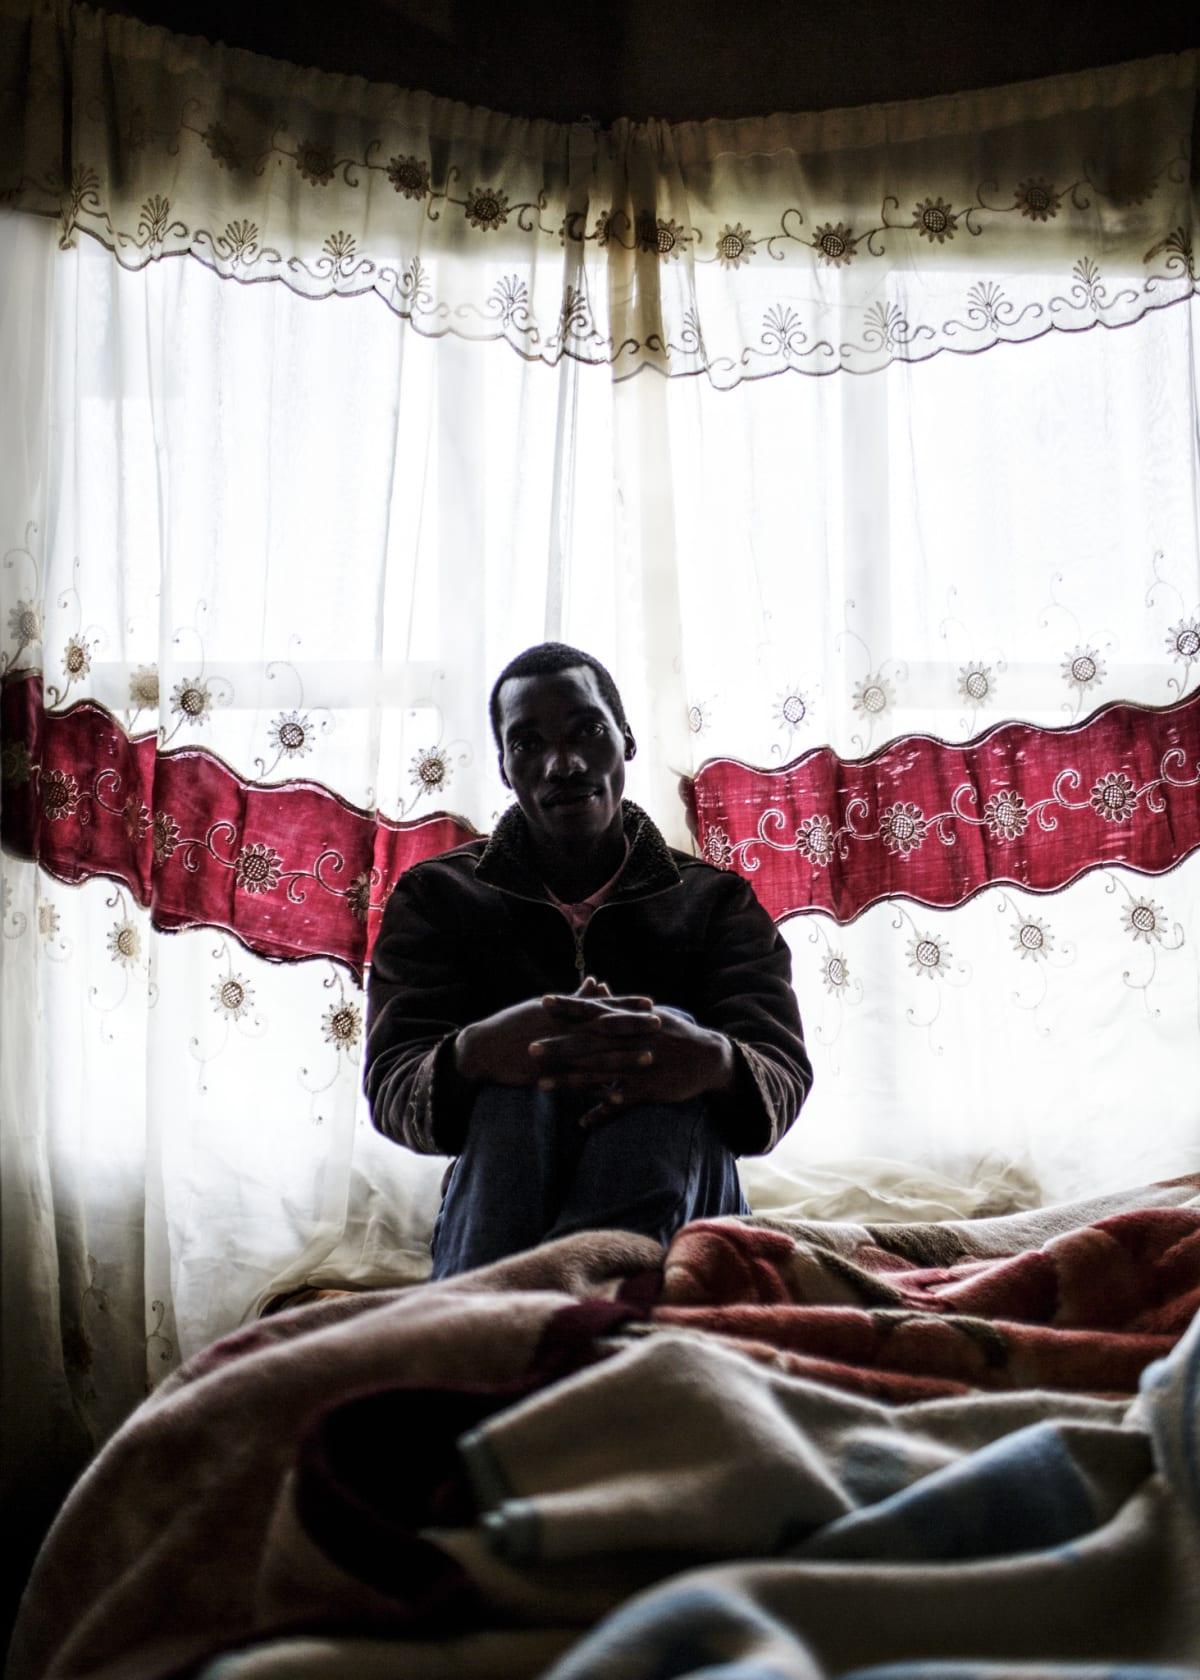 Jonas Bendiksen, Disciple of Moses, South Africa, 2016